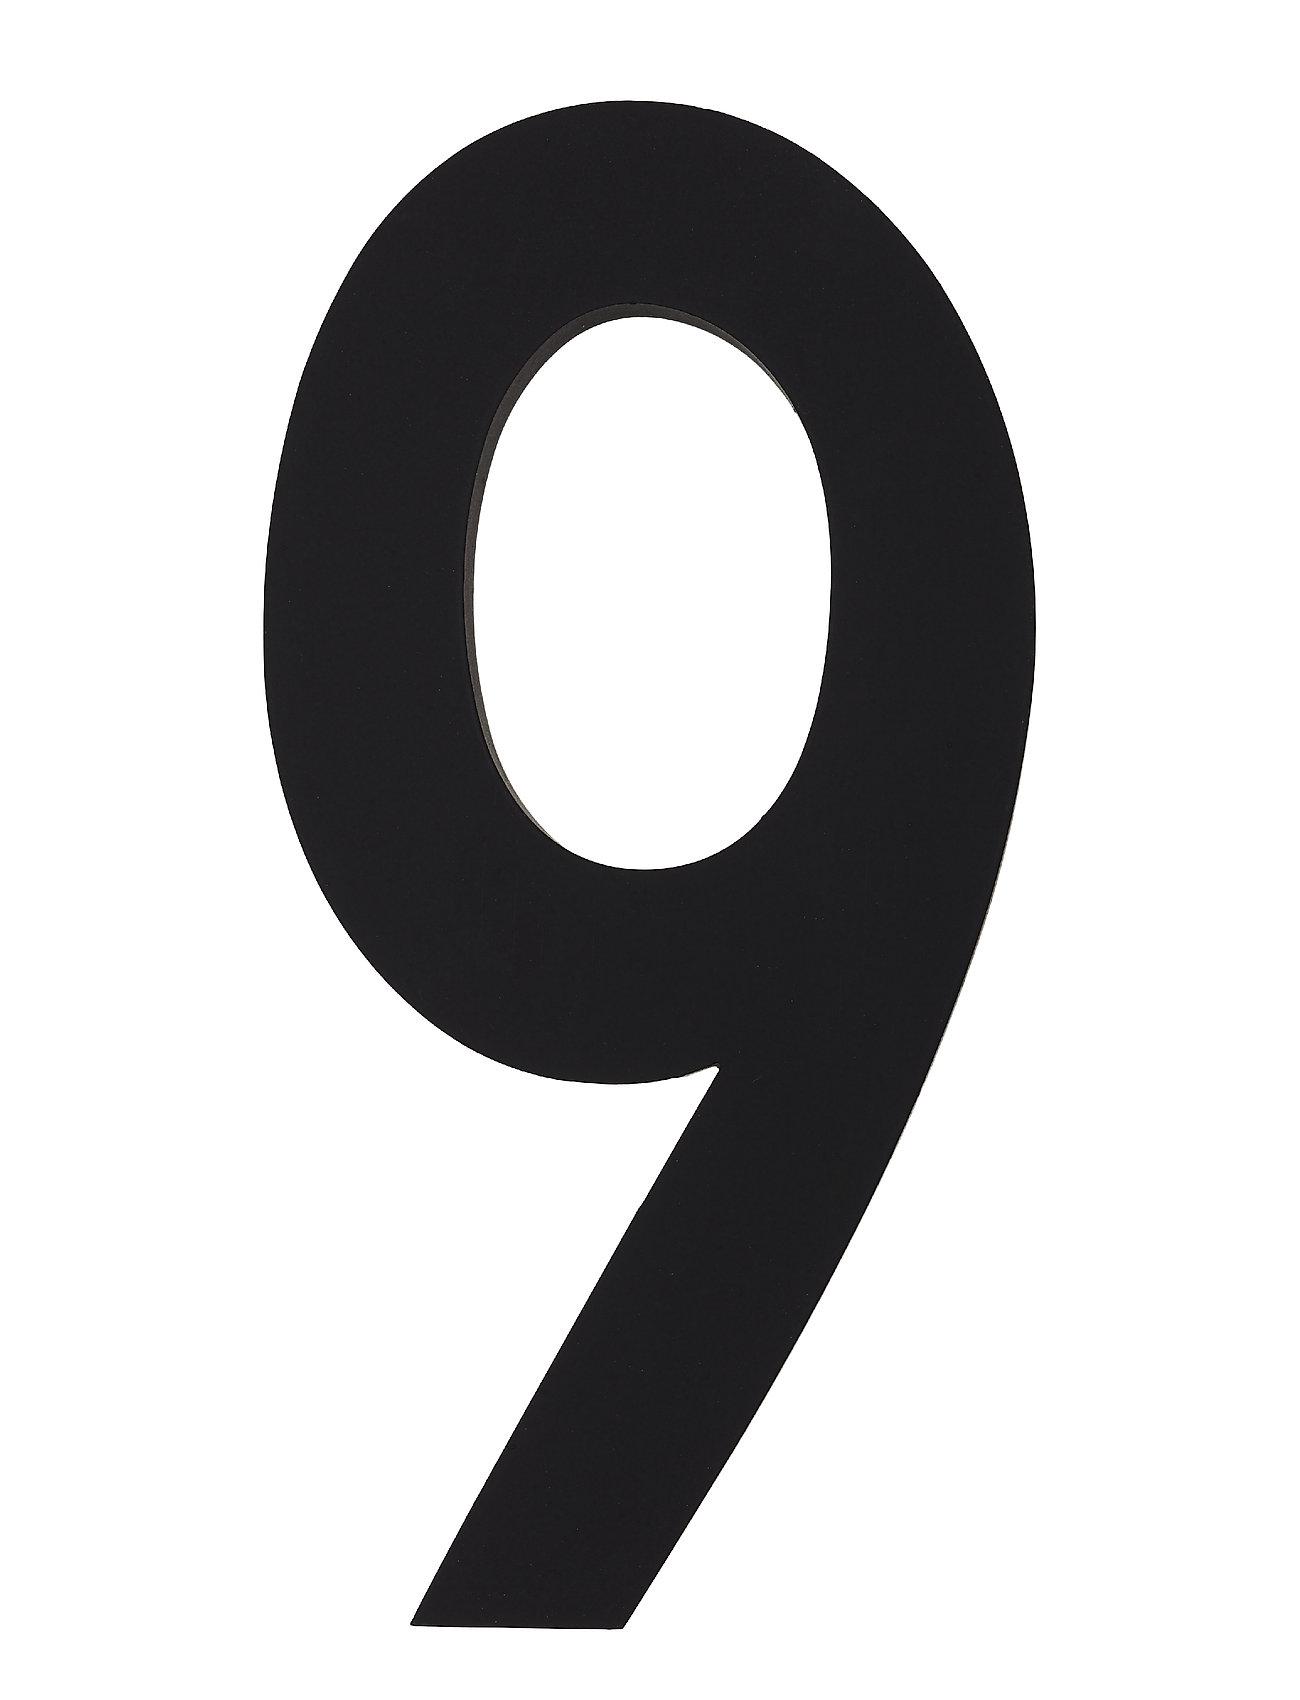 100 Numbers Letters Architecht Architecht MmblackDesign OPZXikTu